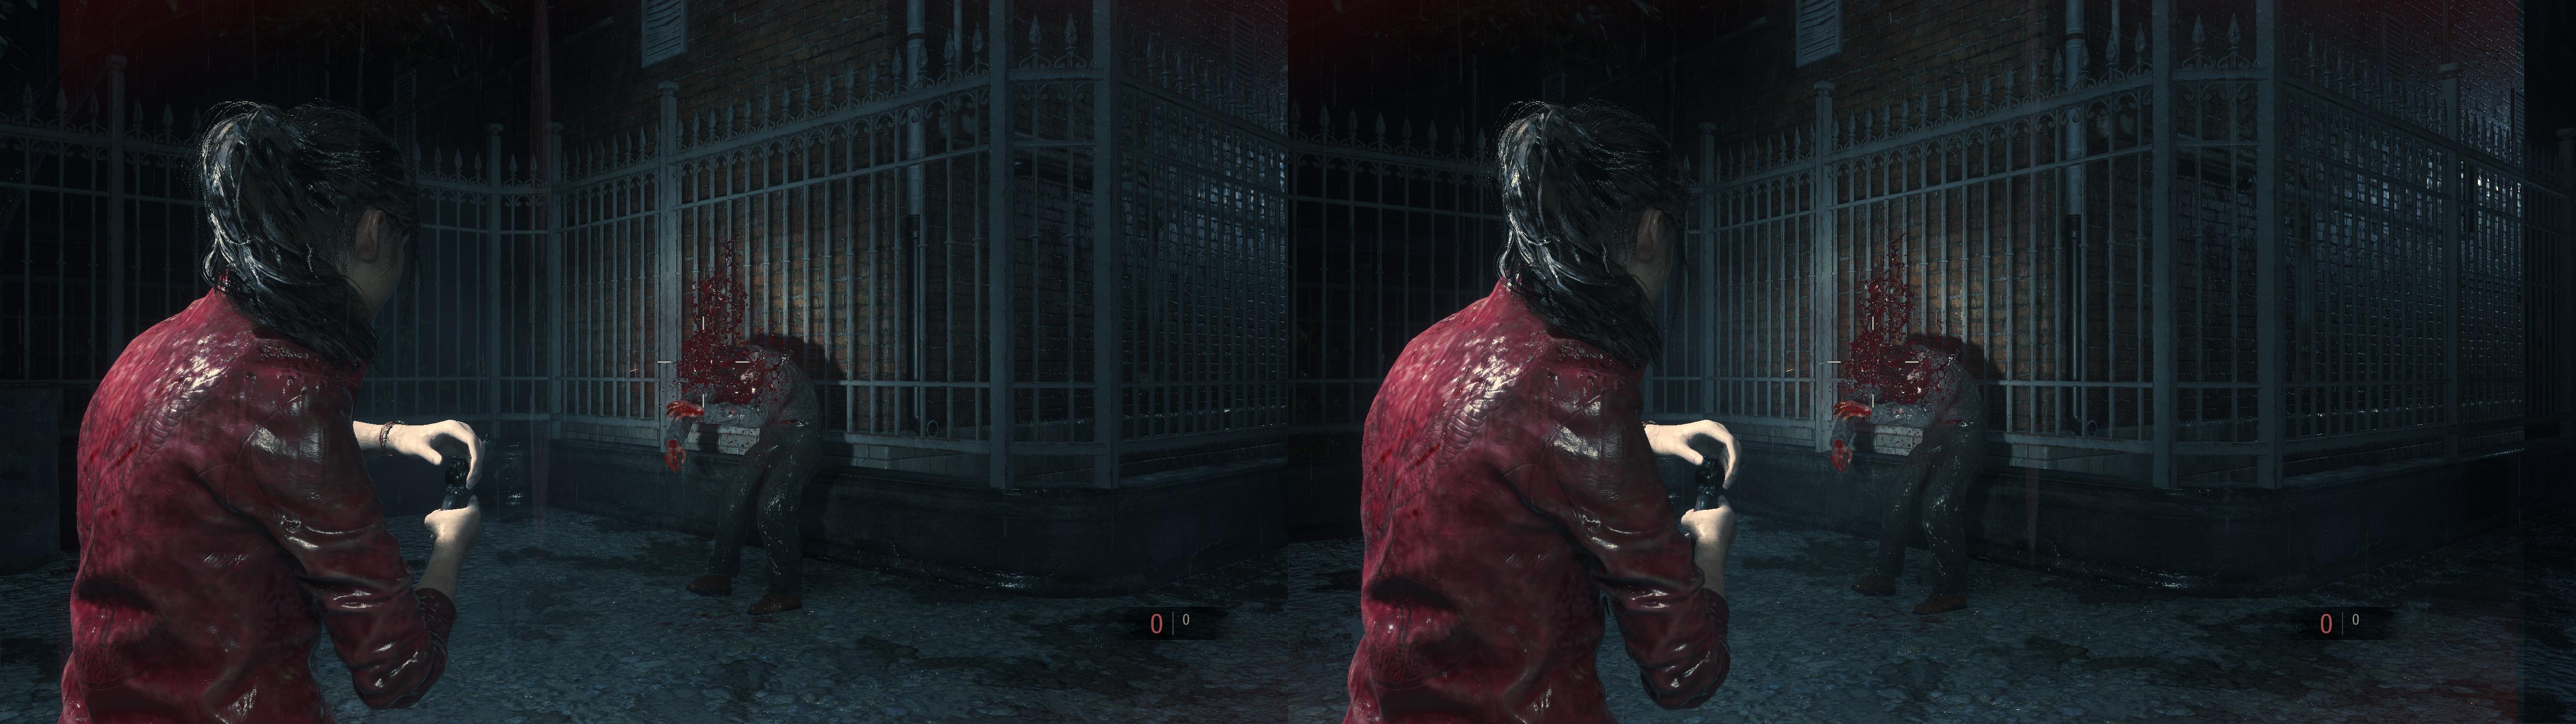 Helix Mod: Resident Evil 2